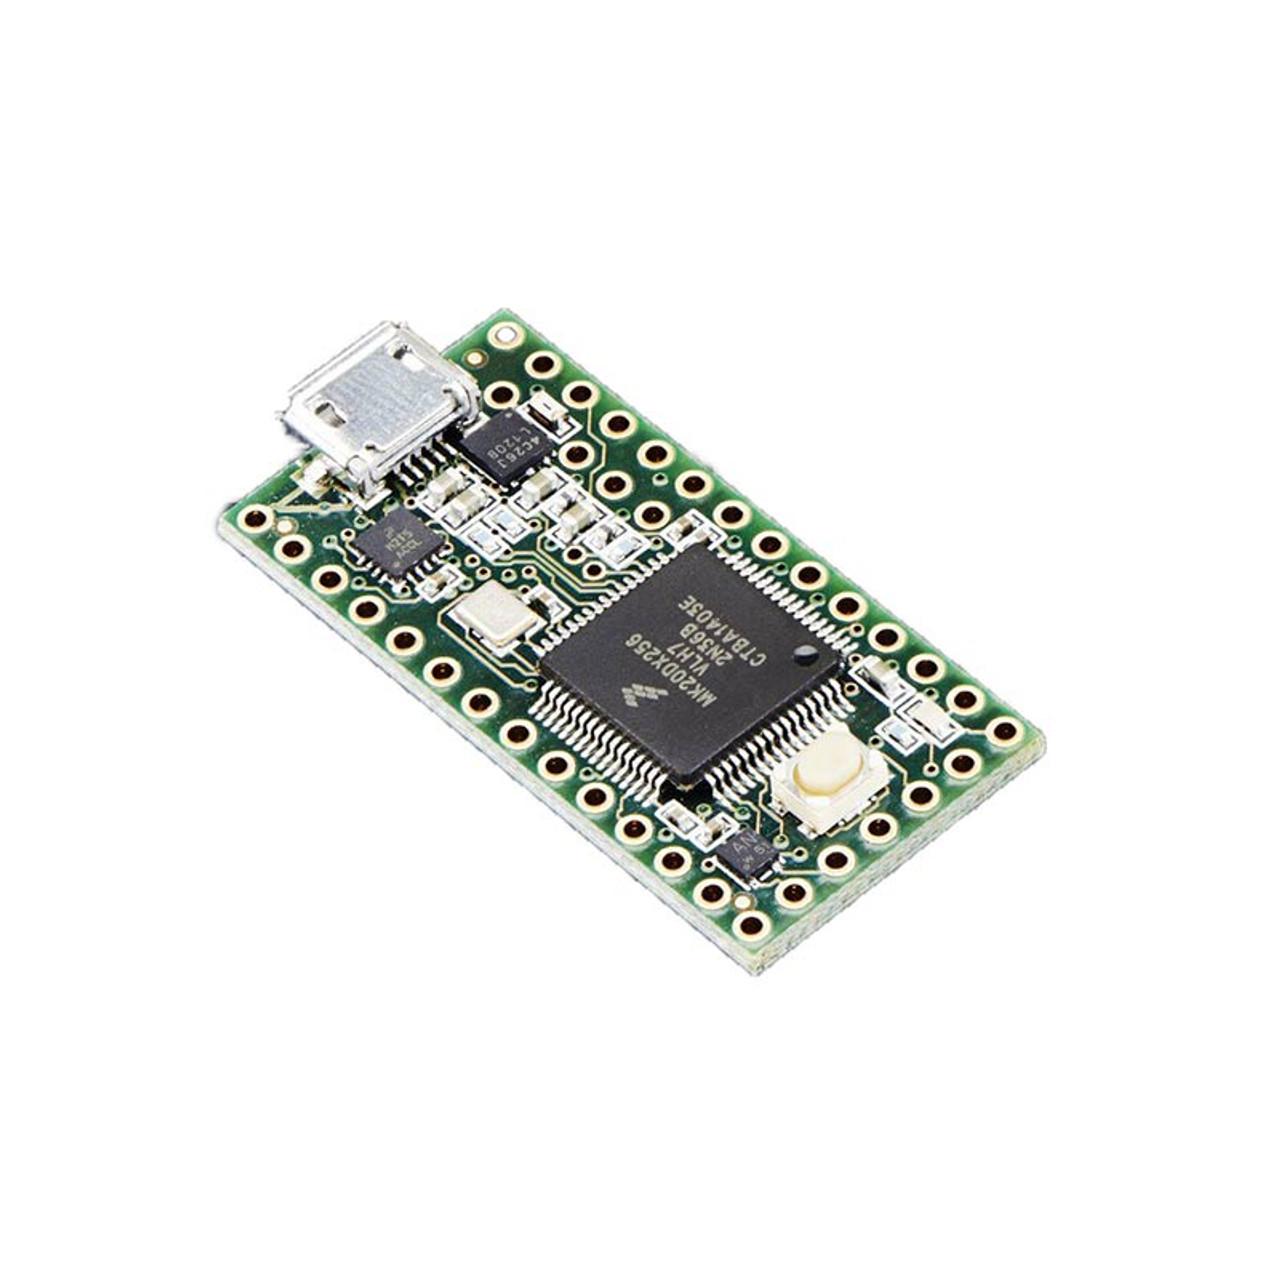 Teensy 3 2 with Header Kinetis ARM Cortex-M4 Evaluation Board